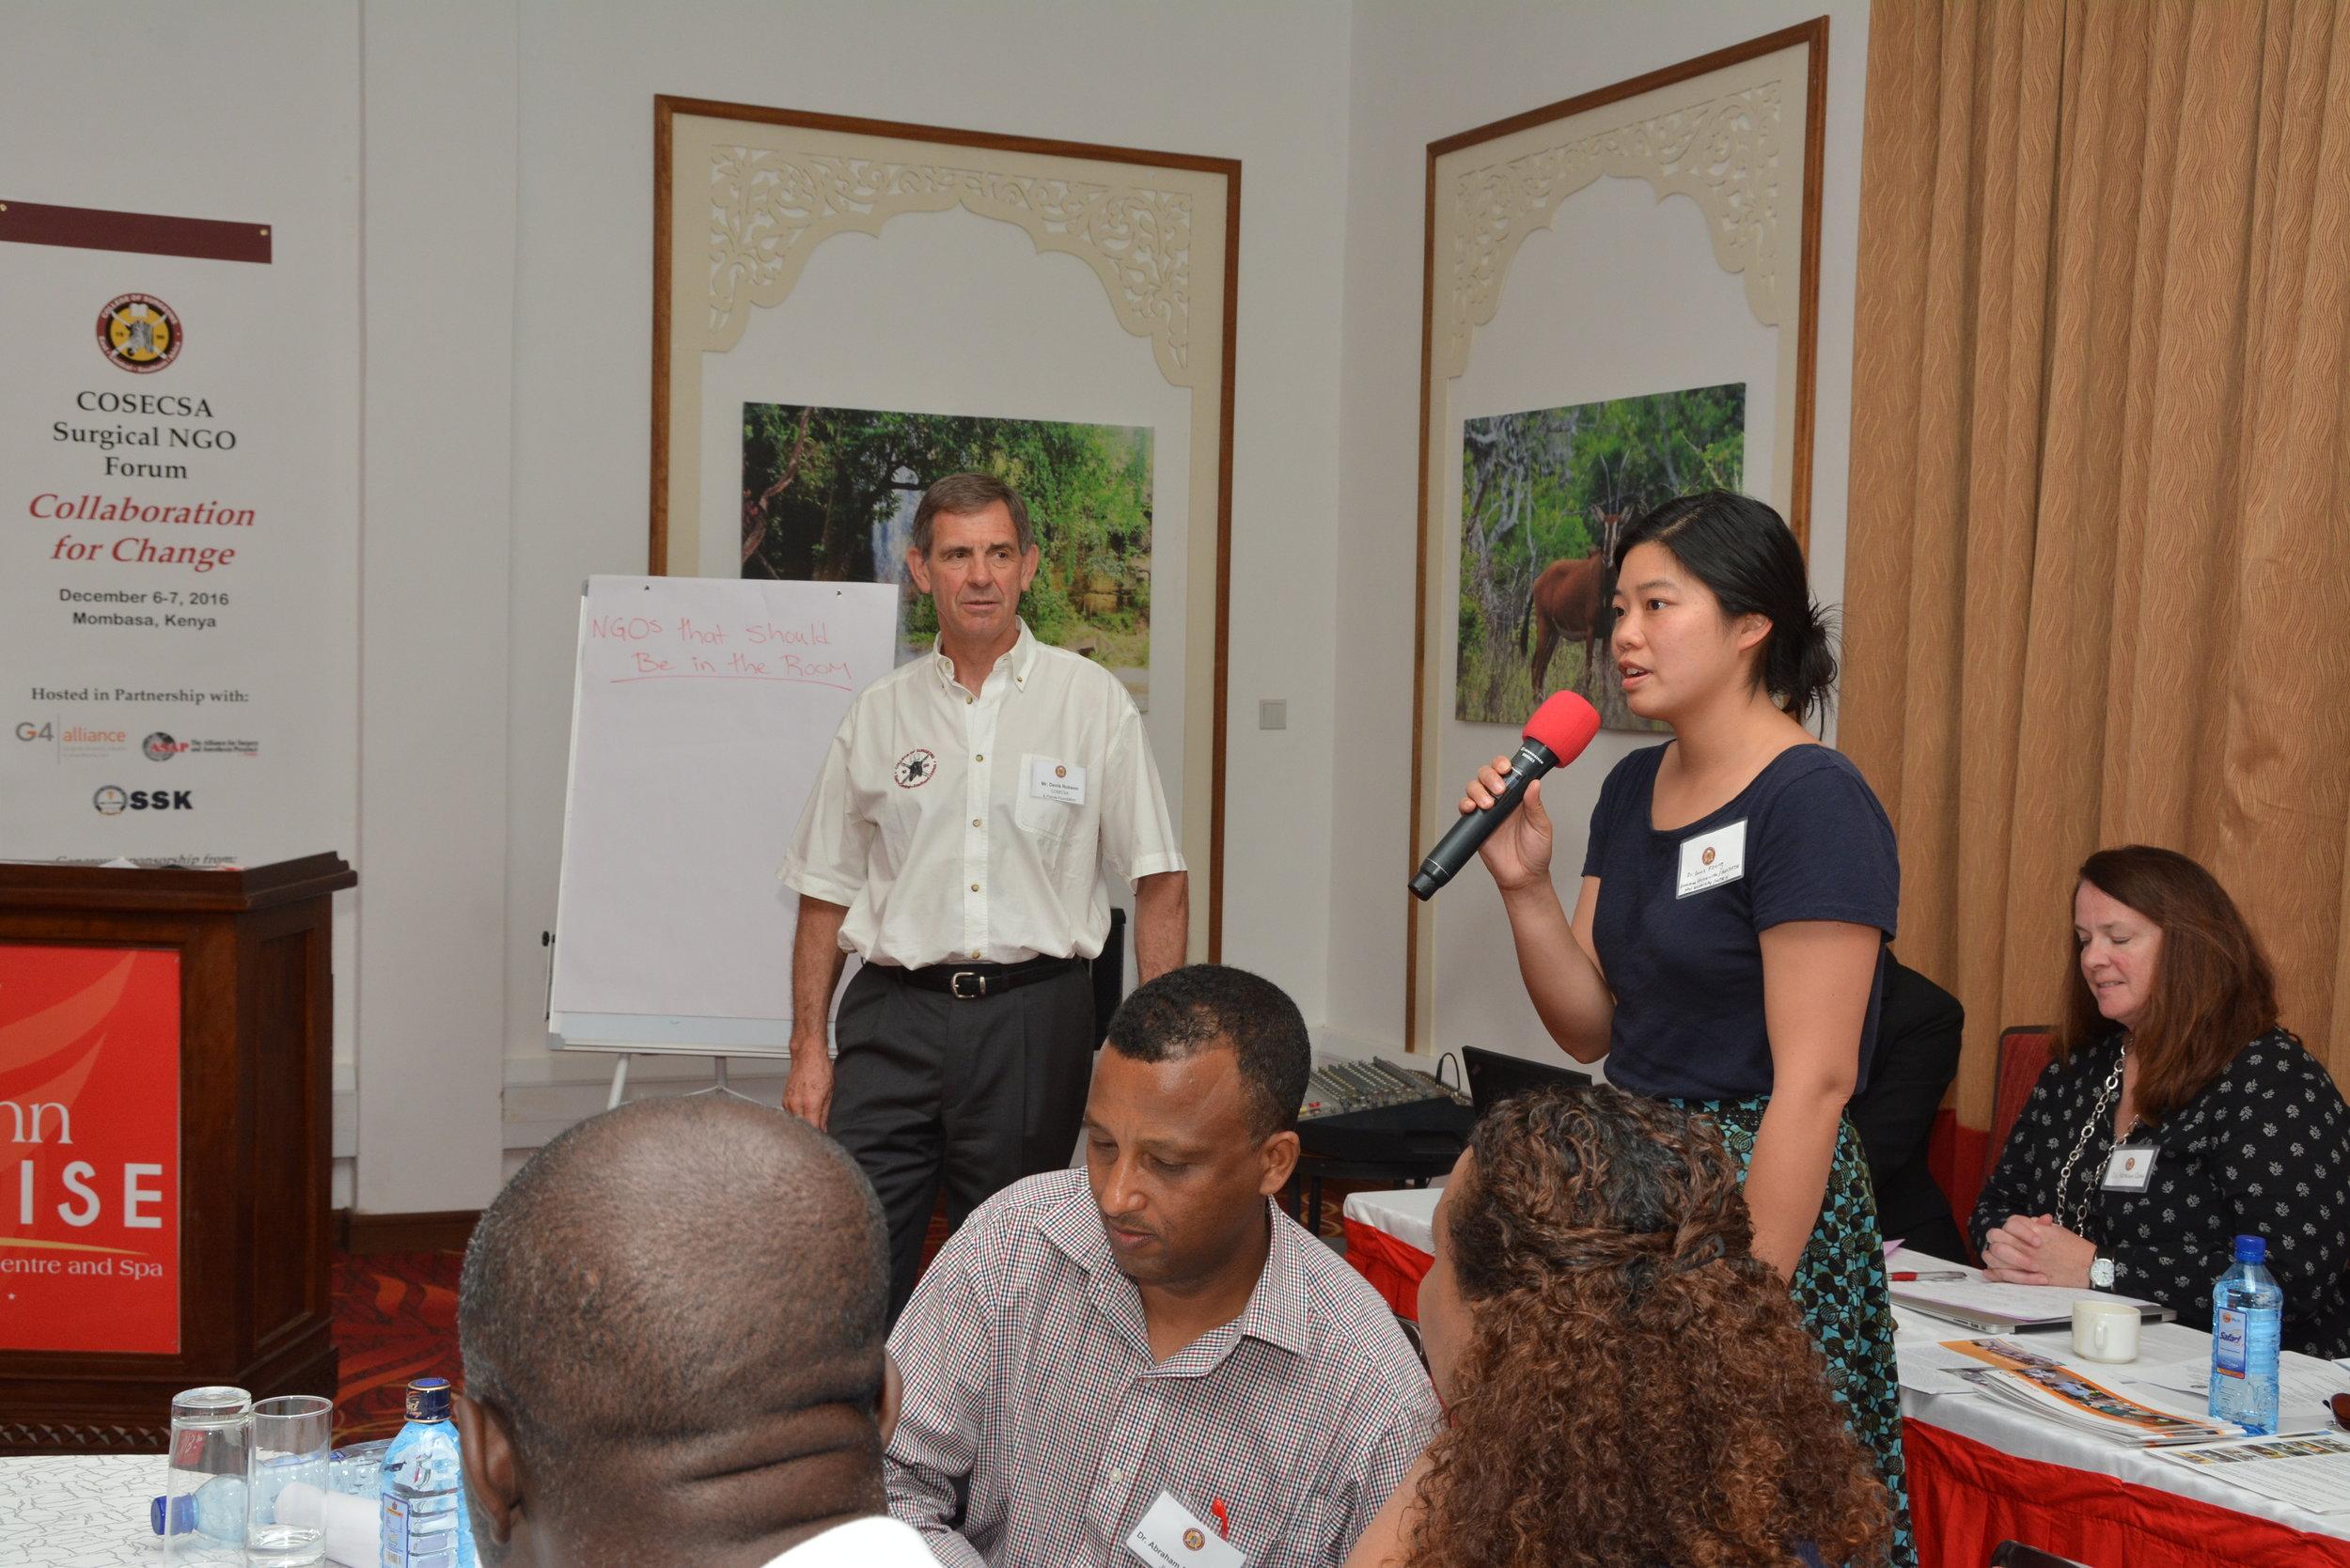 COSECSA Surgical NGO Forum (104).JPG